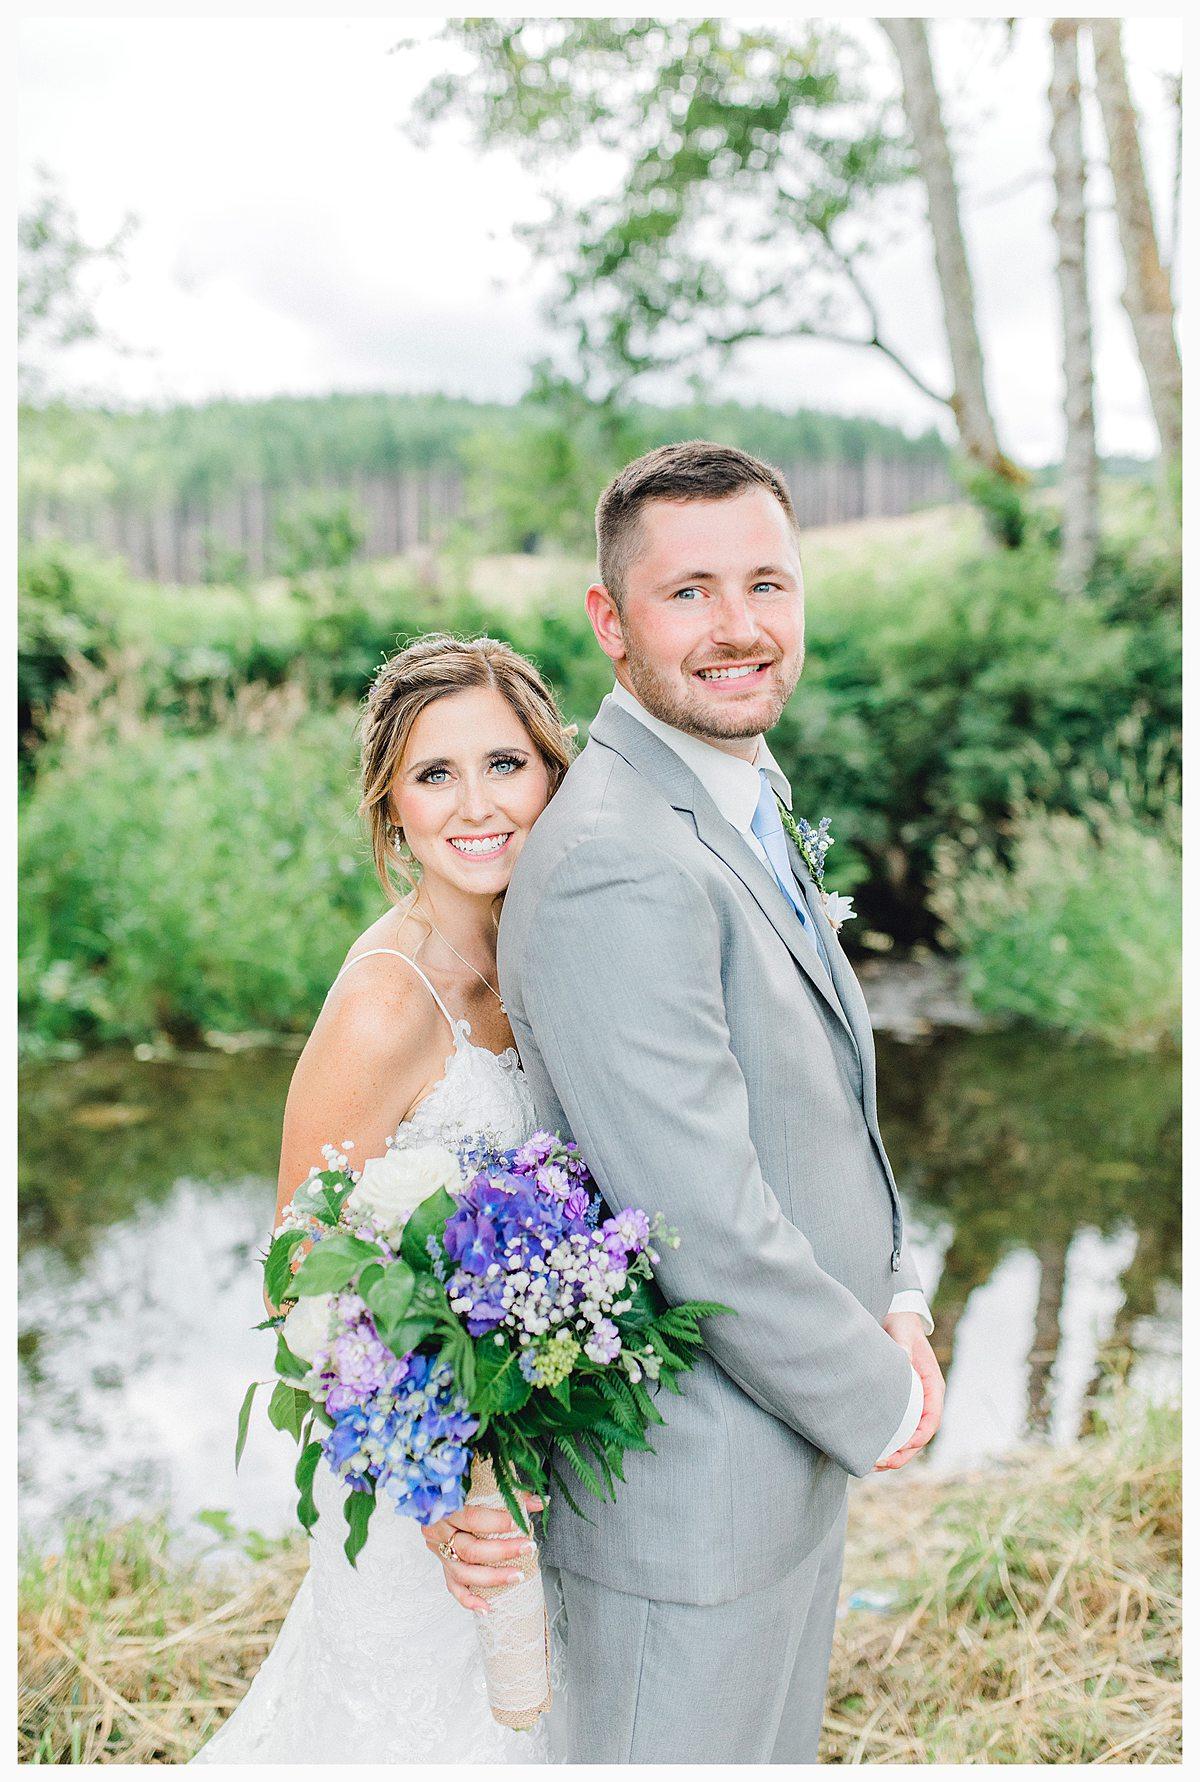 Rustic Coastal Blue Wedding in Southwest Washington, Emma Rose Company, Seattle and Portland Wedding Photographer, Light and Airy_0089.jpg